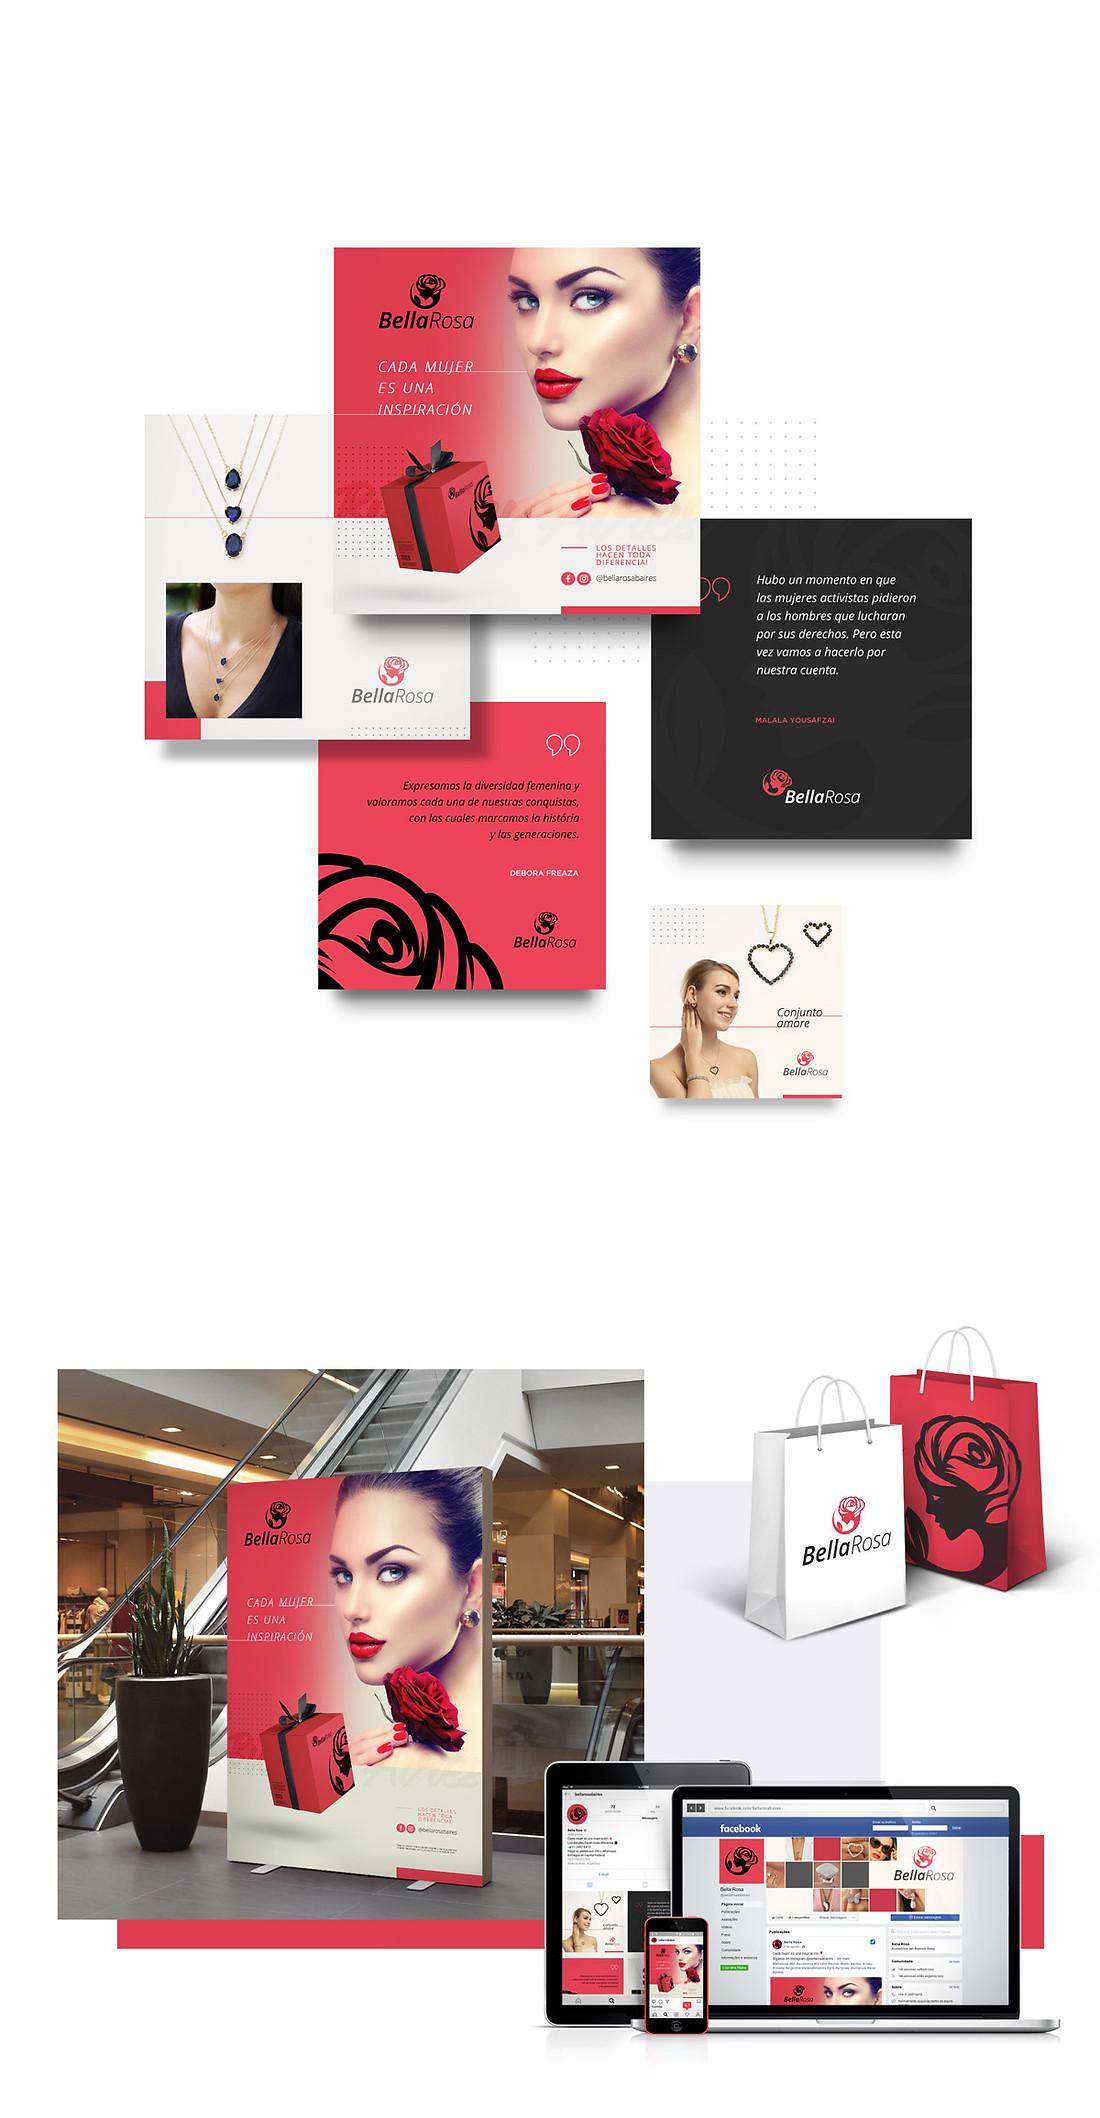 Bella Rosa marketing digital